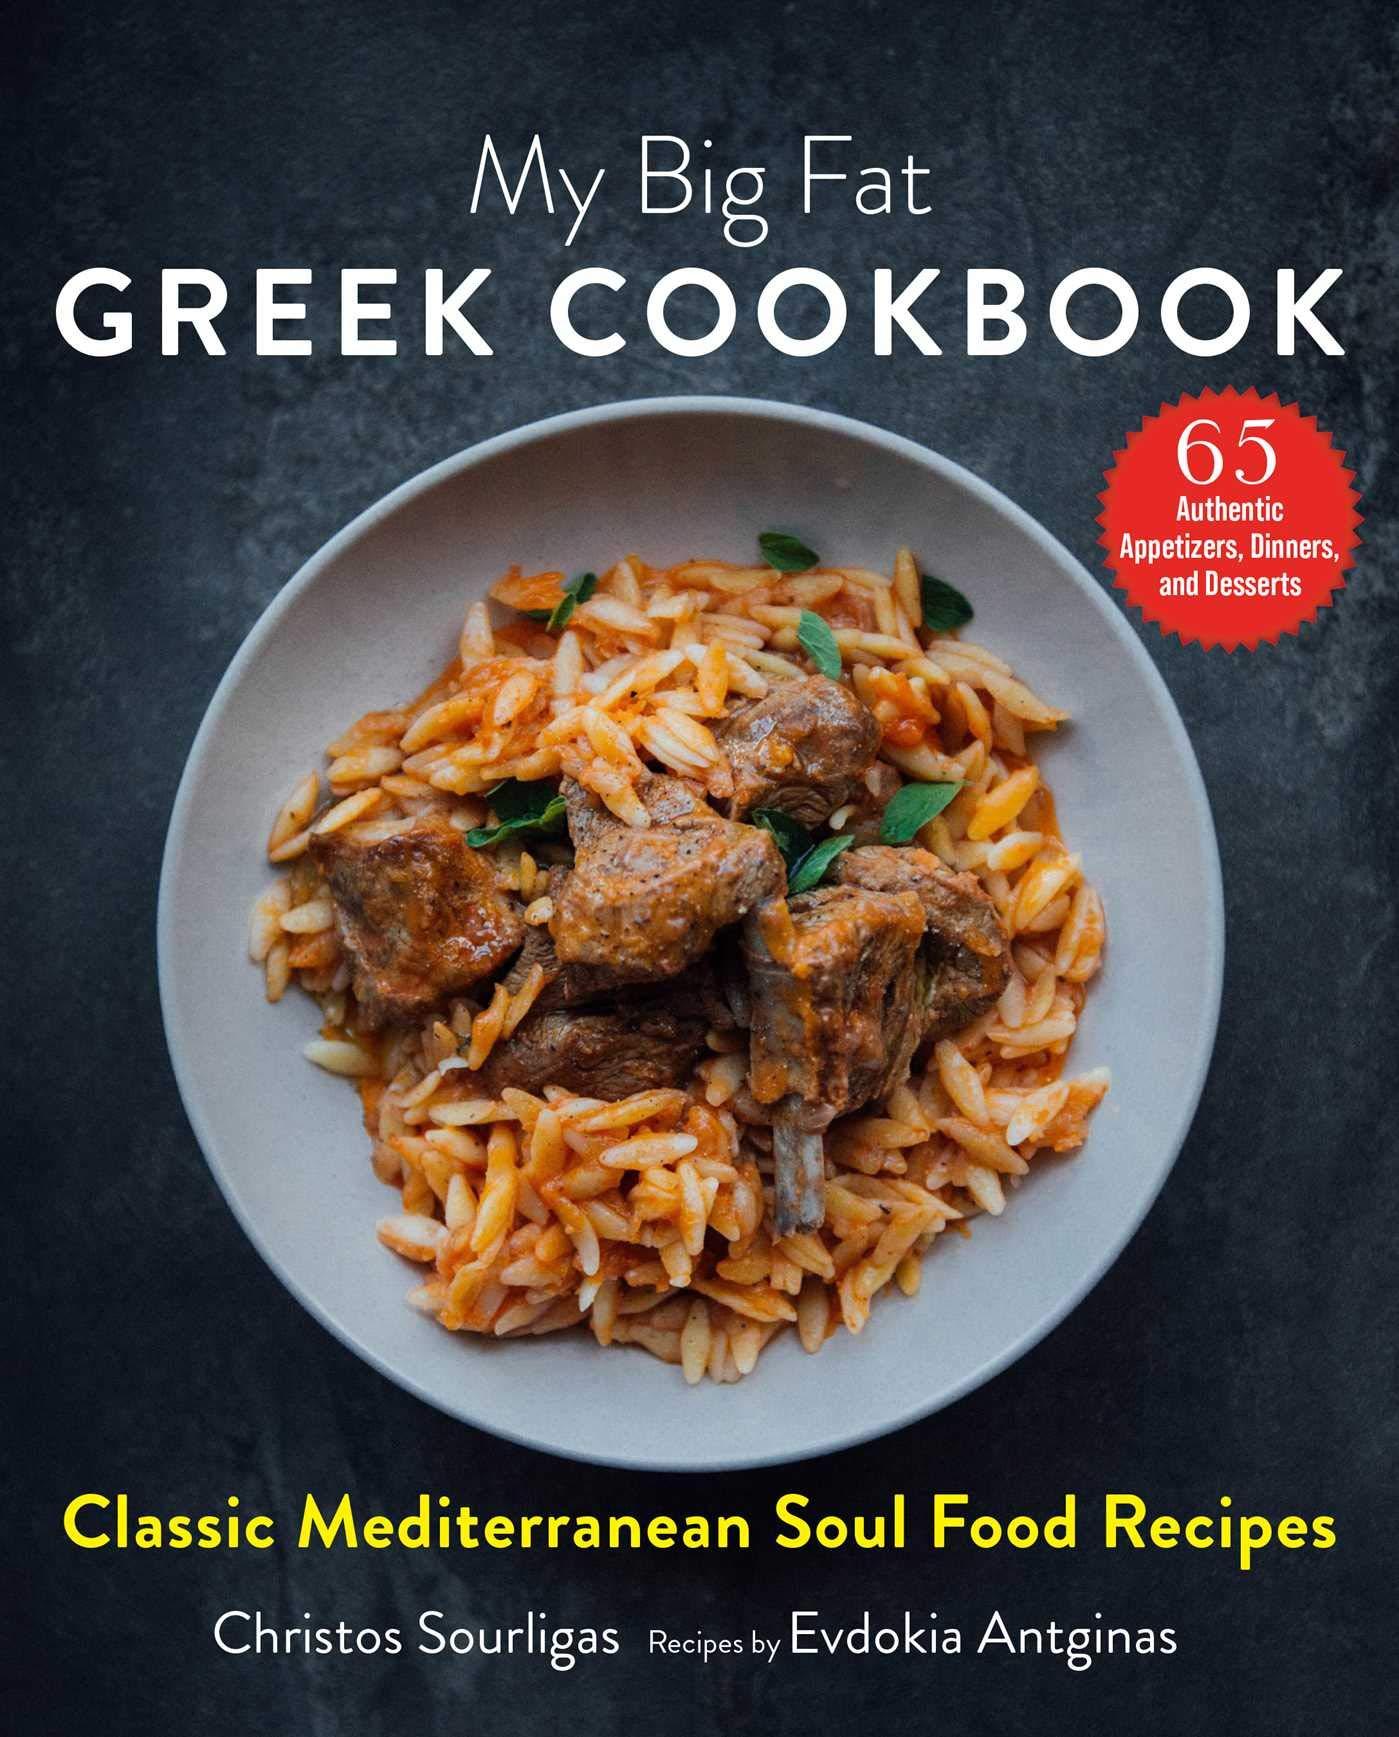 My Big Fat Greek Cookbook Classic Mediterranean Soul Food Recipes Amazon De Sourligas Christos Antginas Evdokia Tsarouchas Angelo Fremdsprachige Bucher